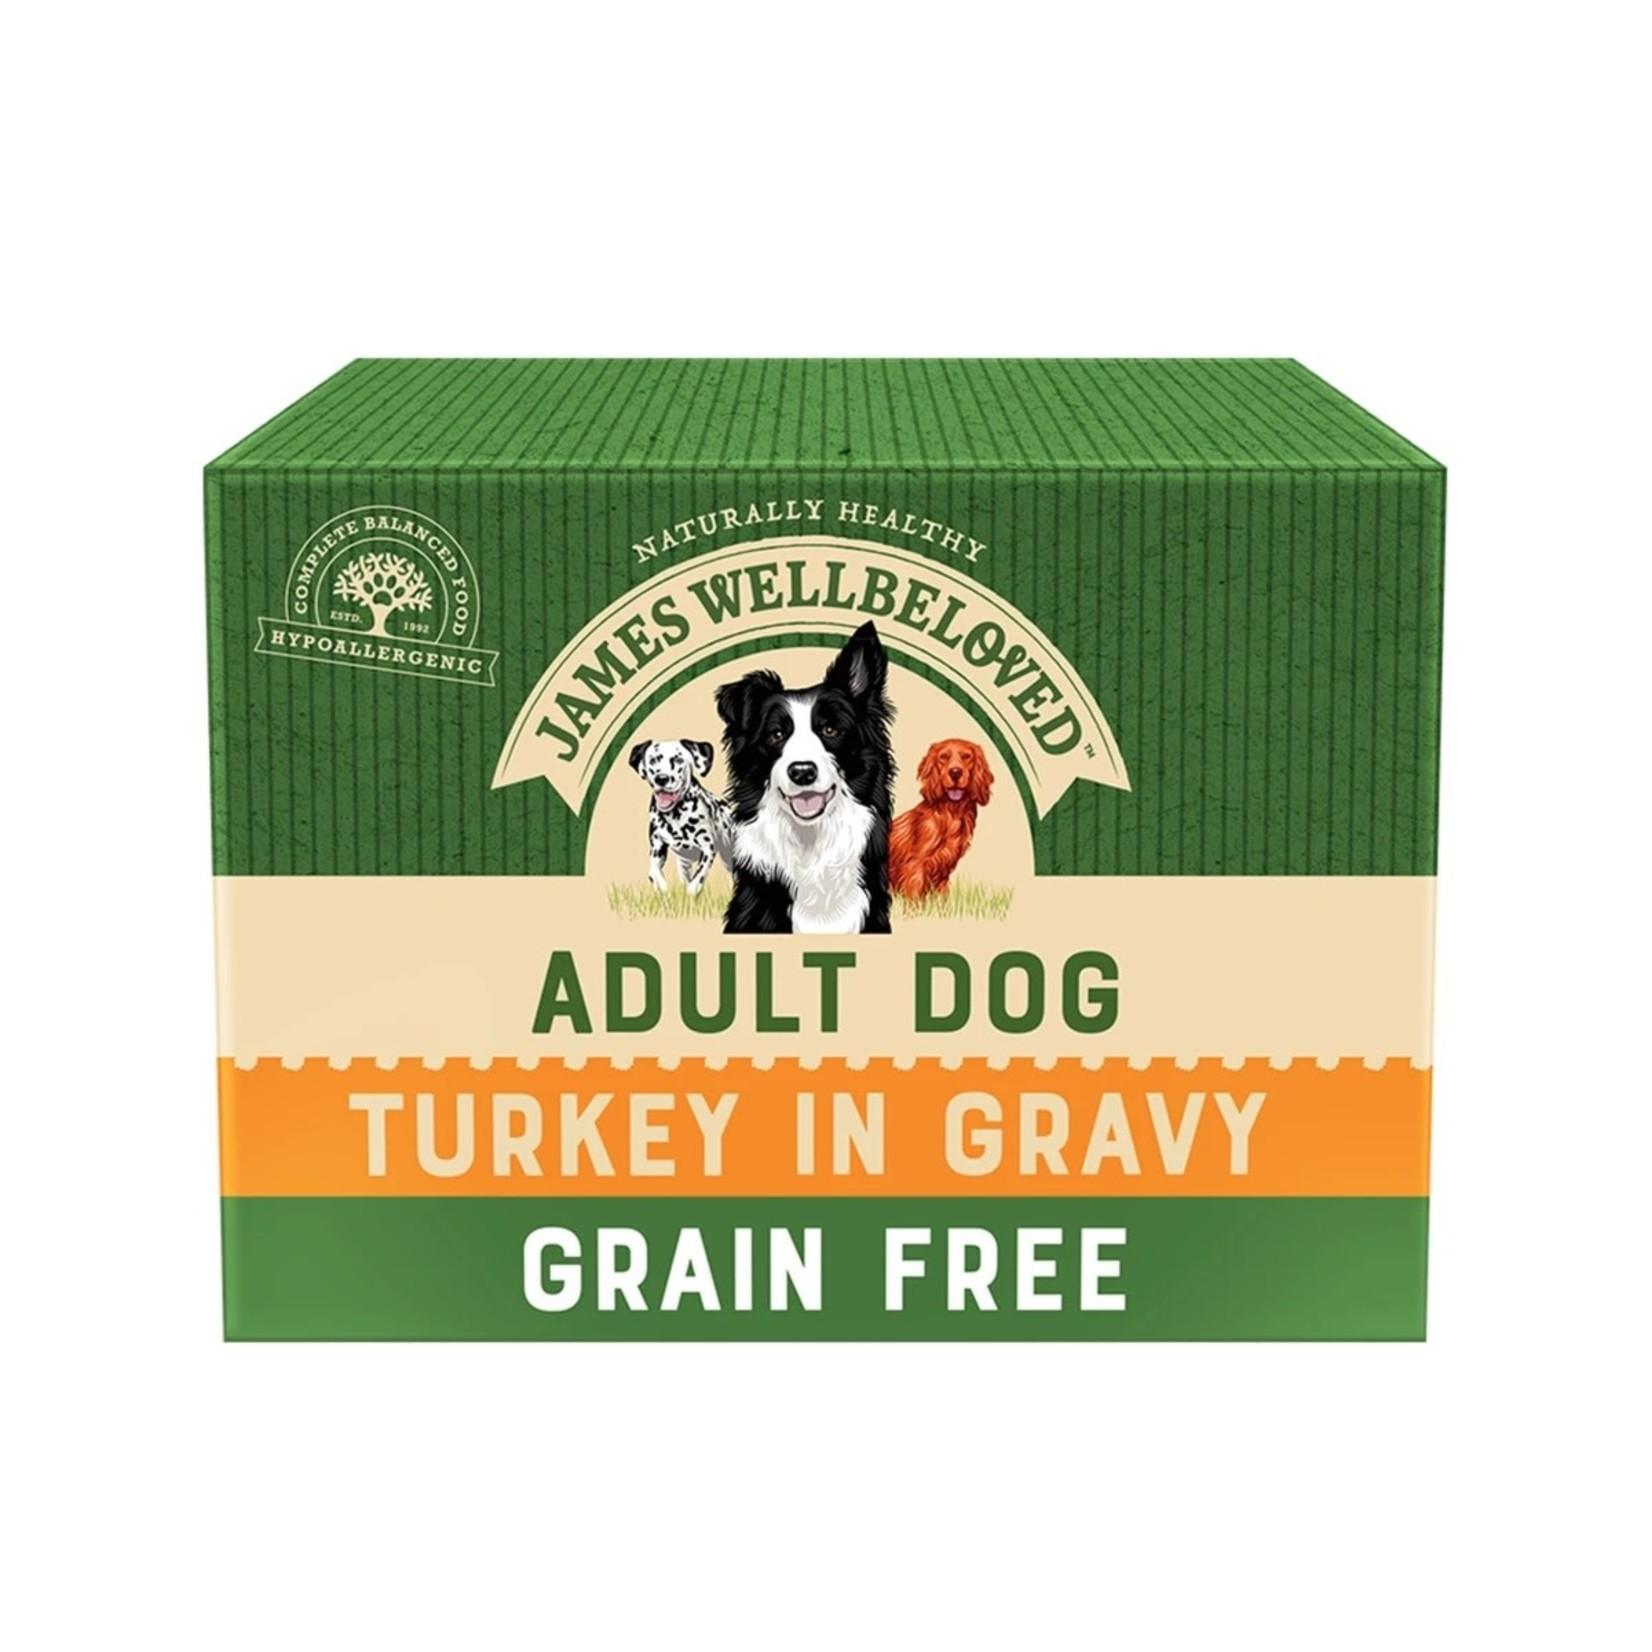 James Wellbeloved Grain Free Adult Dog Wet Food Pouch, Turkey, 100g, Box of 12